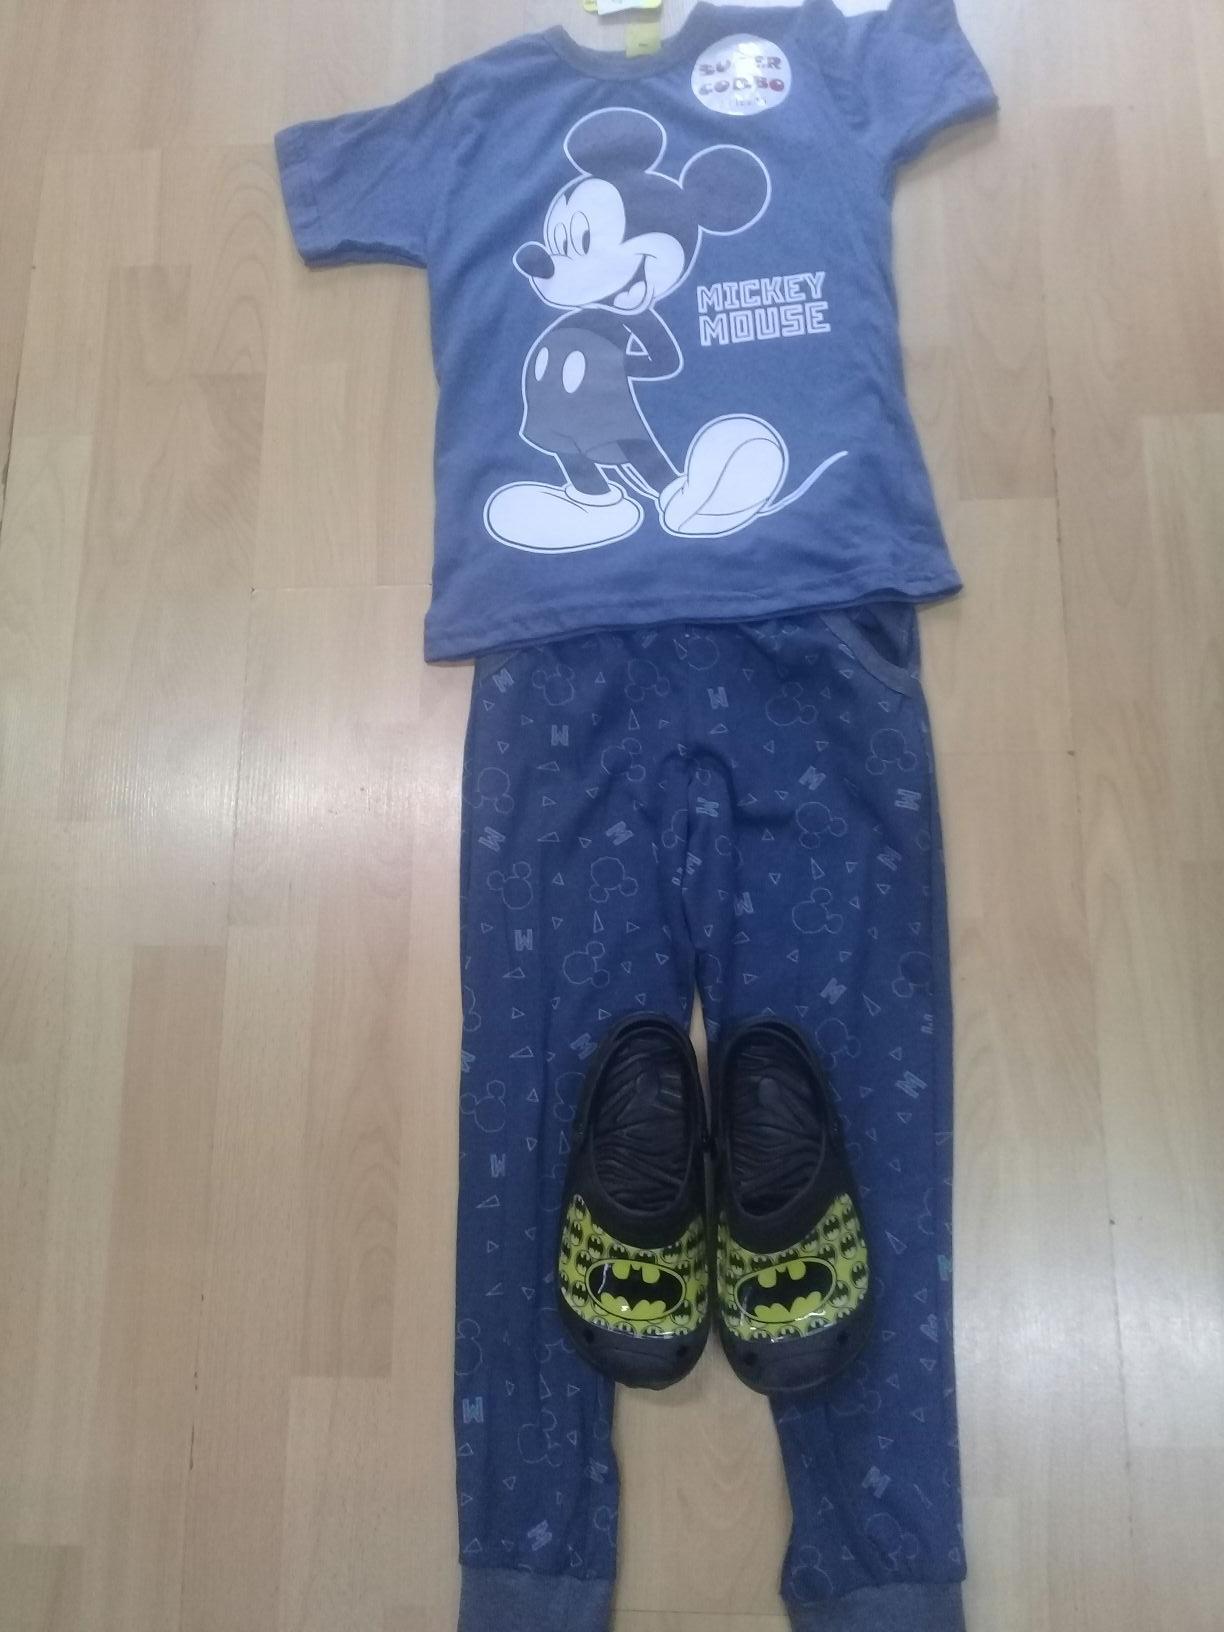 Walmart: Conjunto pijama de micky y sandalias de batman